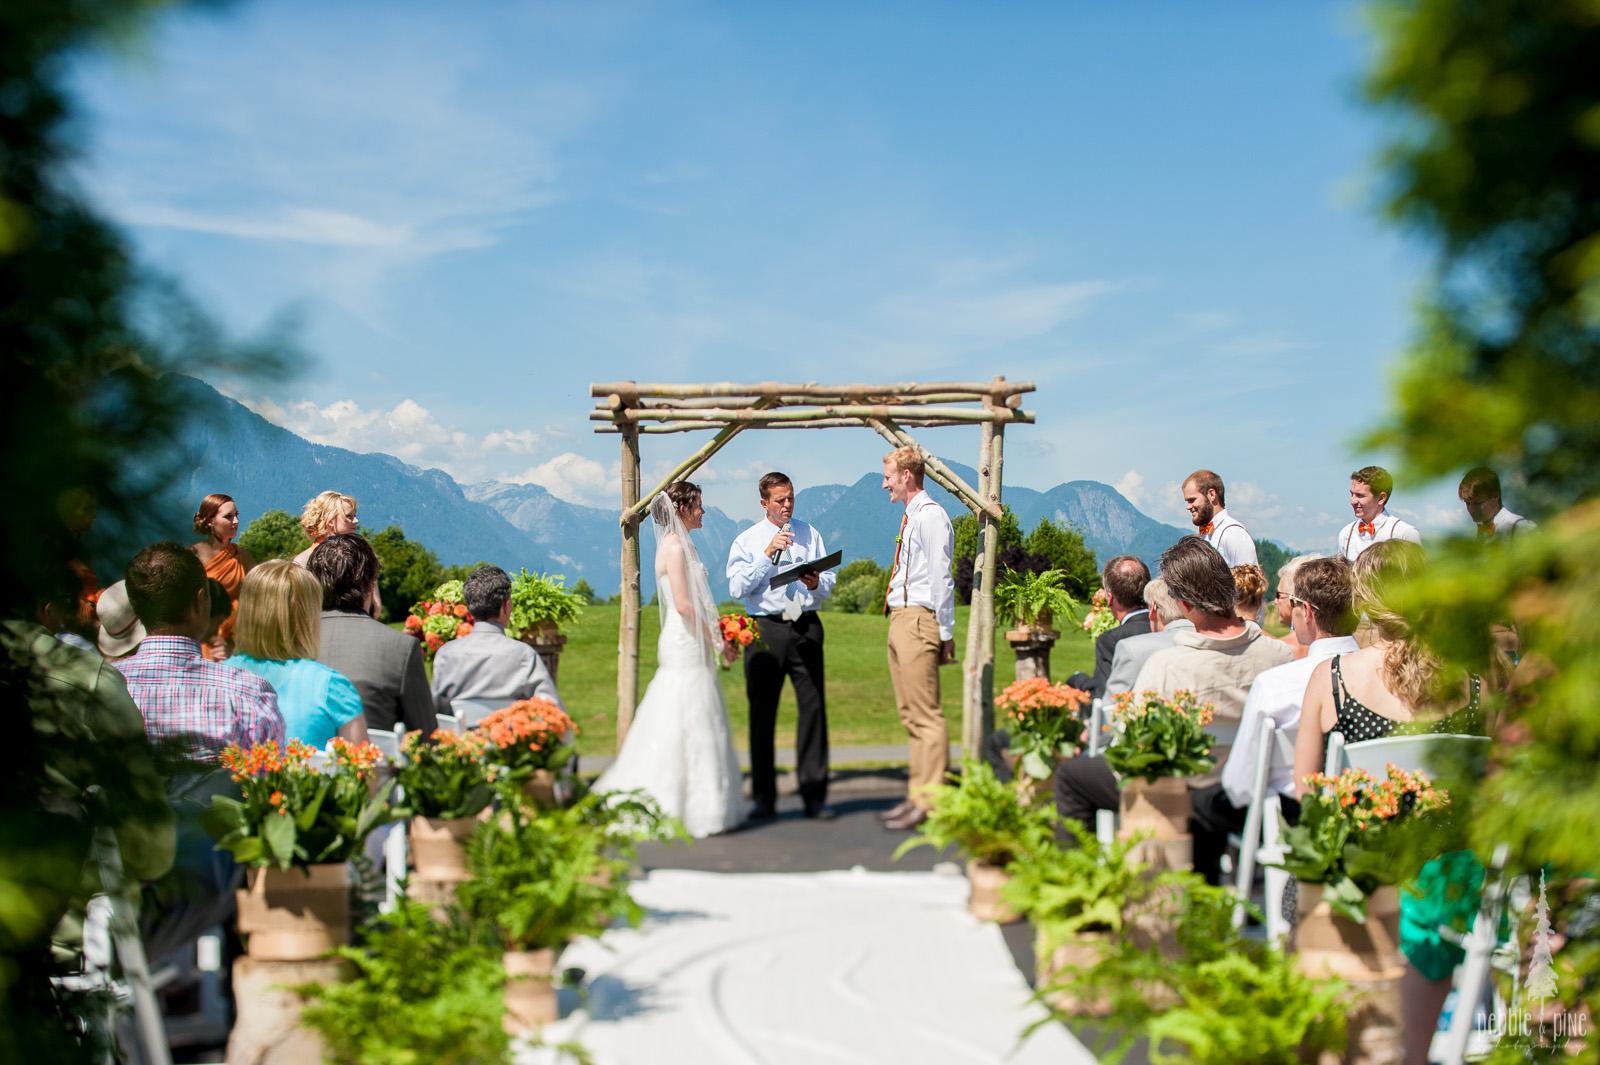 vancouver-island-wedding-photographers-golden-eagle-golf-course-wedding-mountaintop-wedding-18.jpg